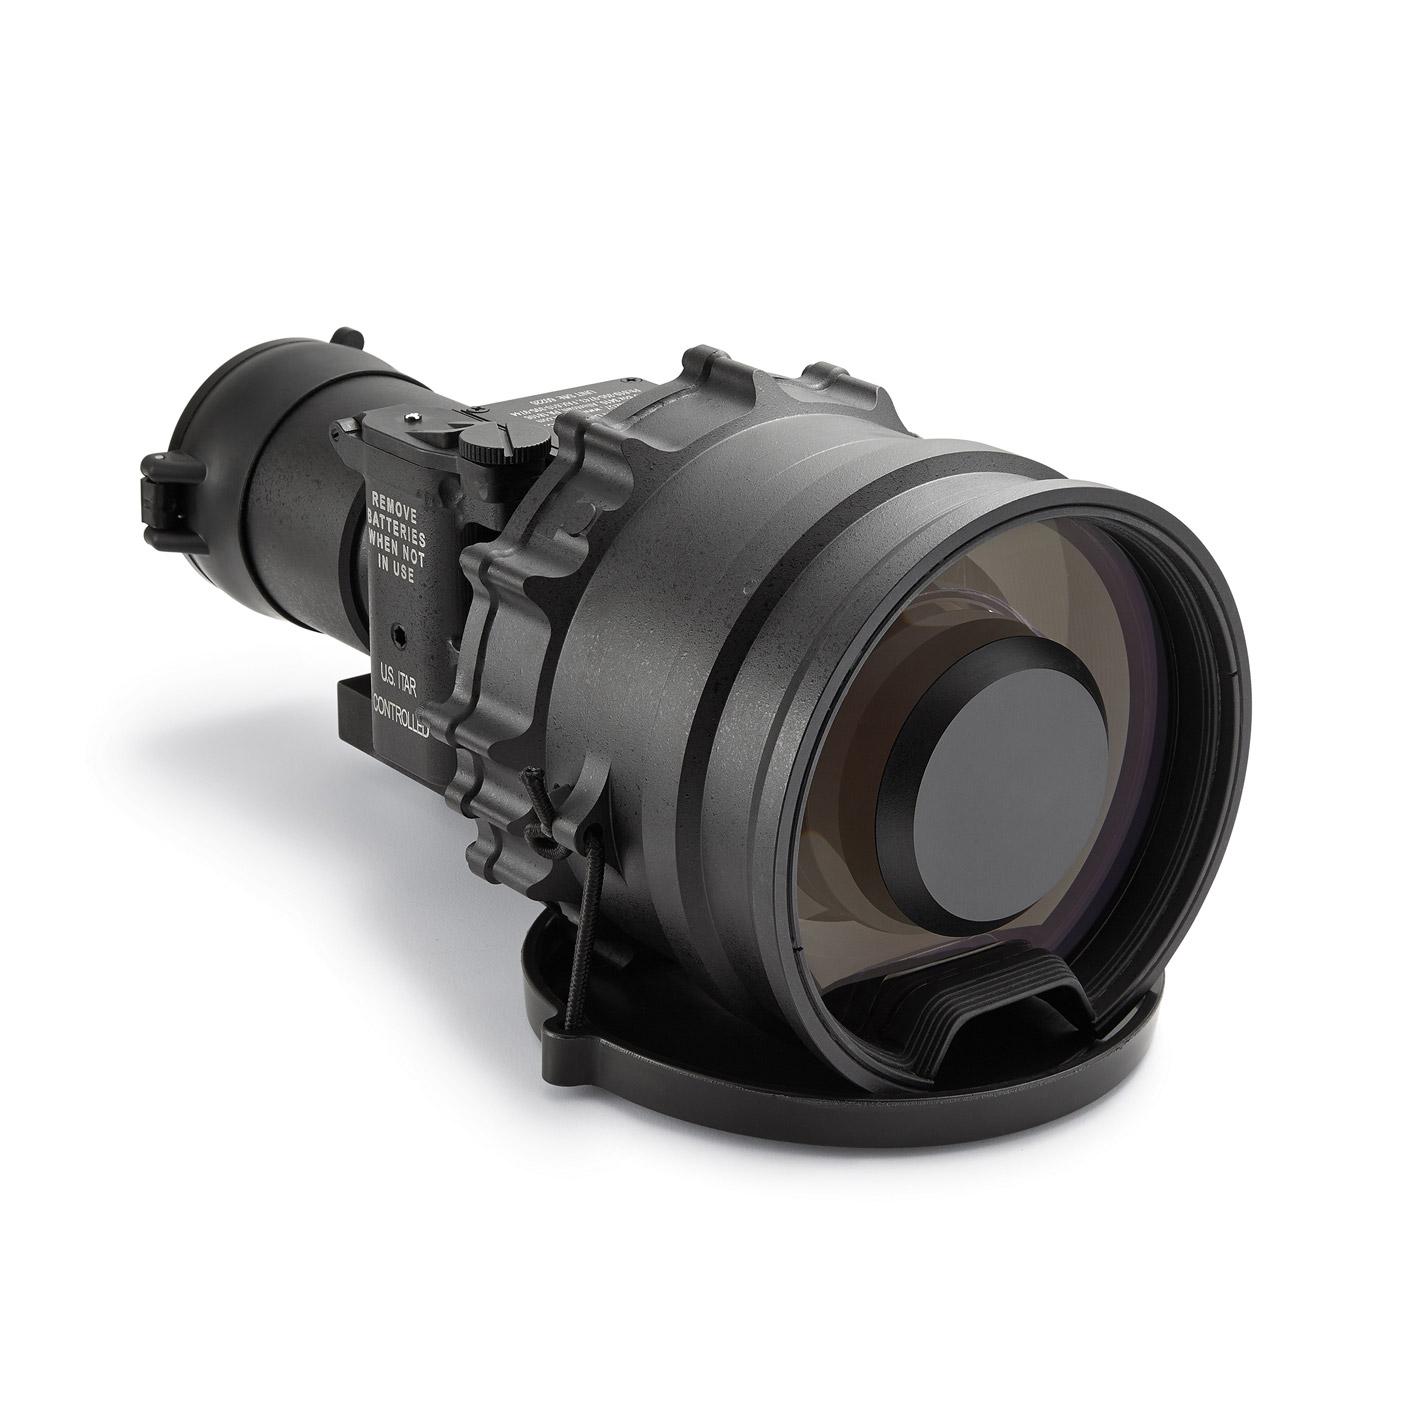 MilSight™ S135 MUNS™ Night Vision Weapon Sight